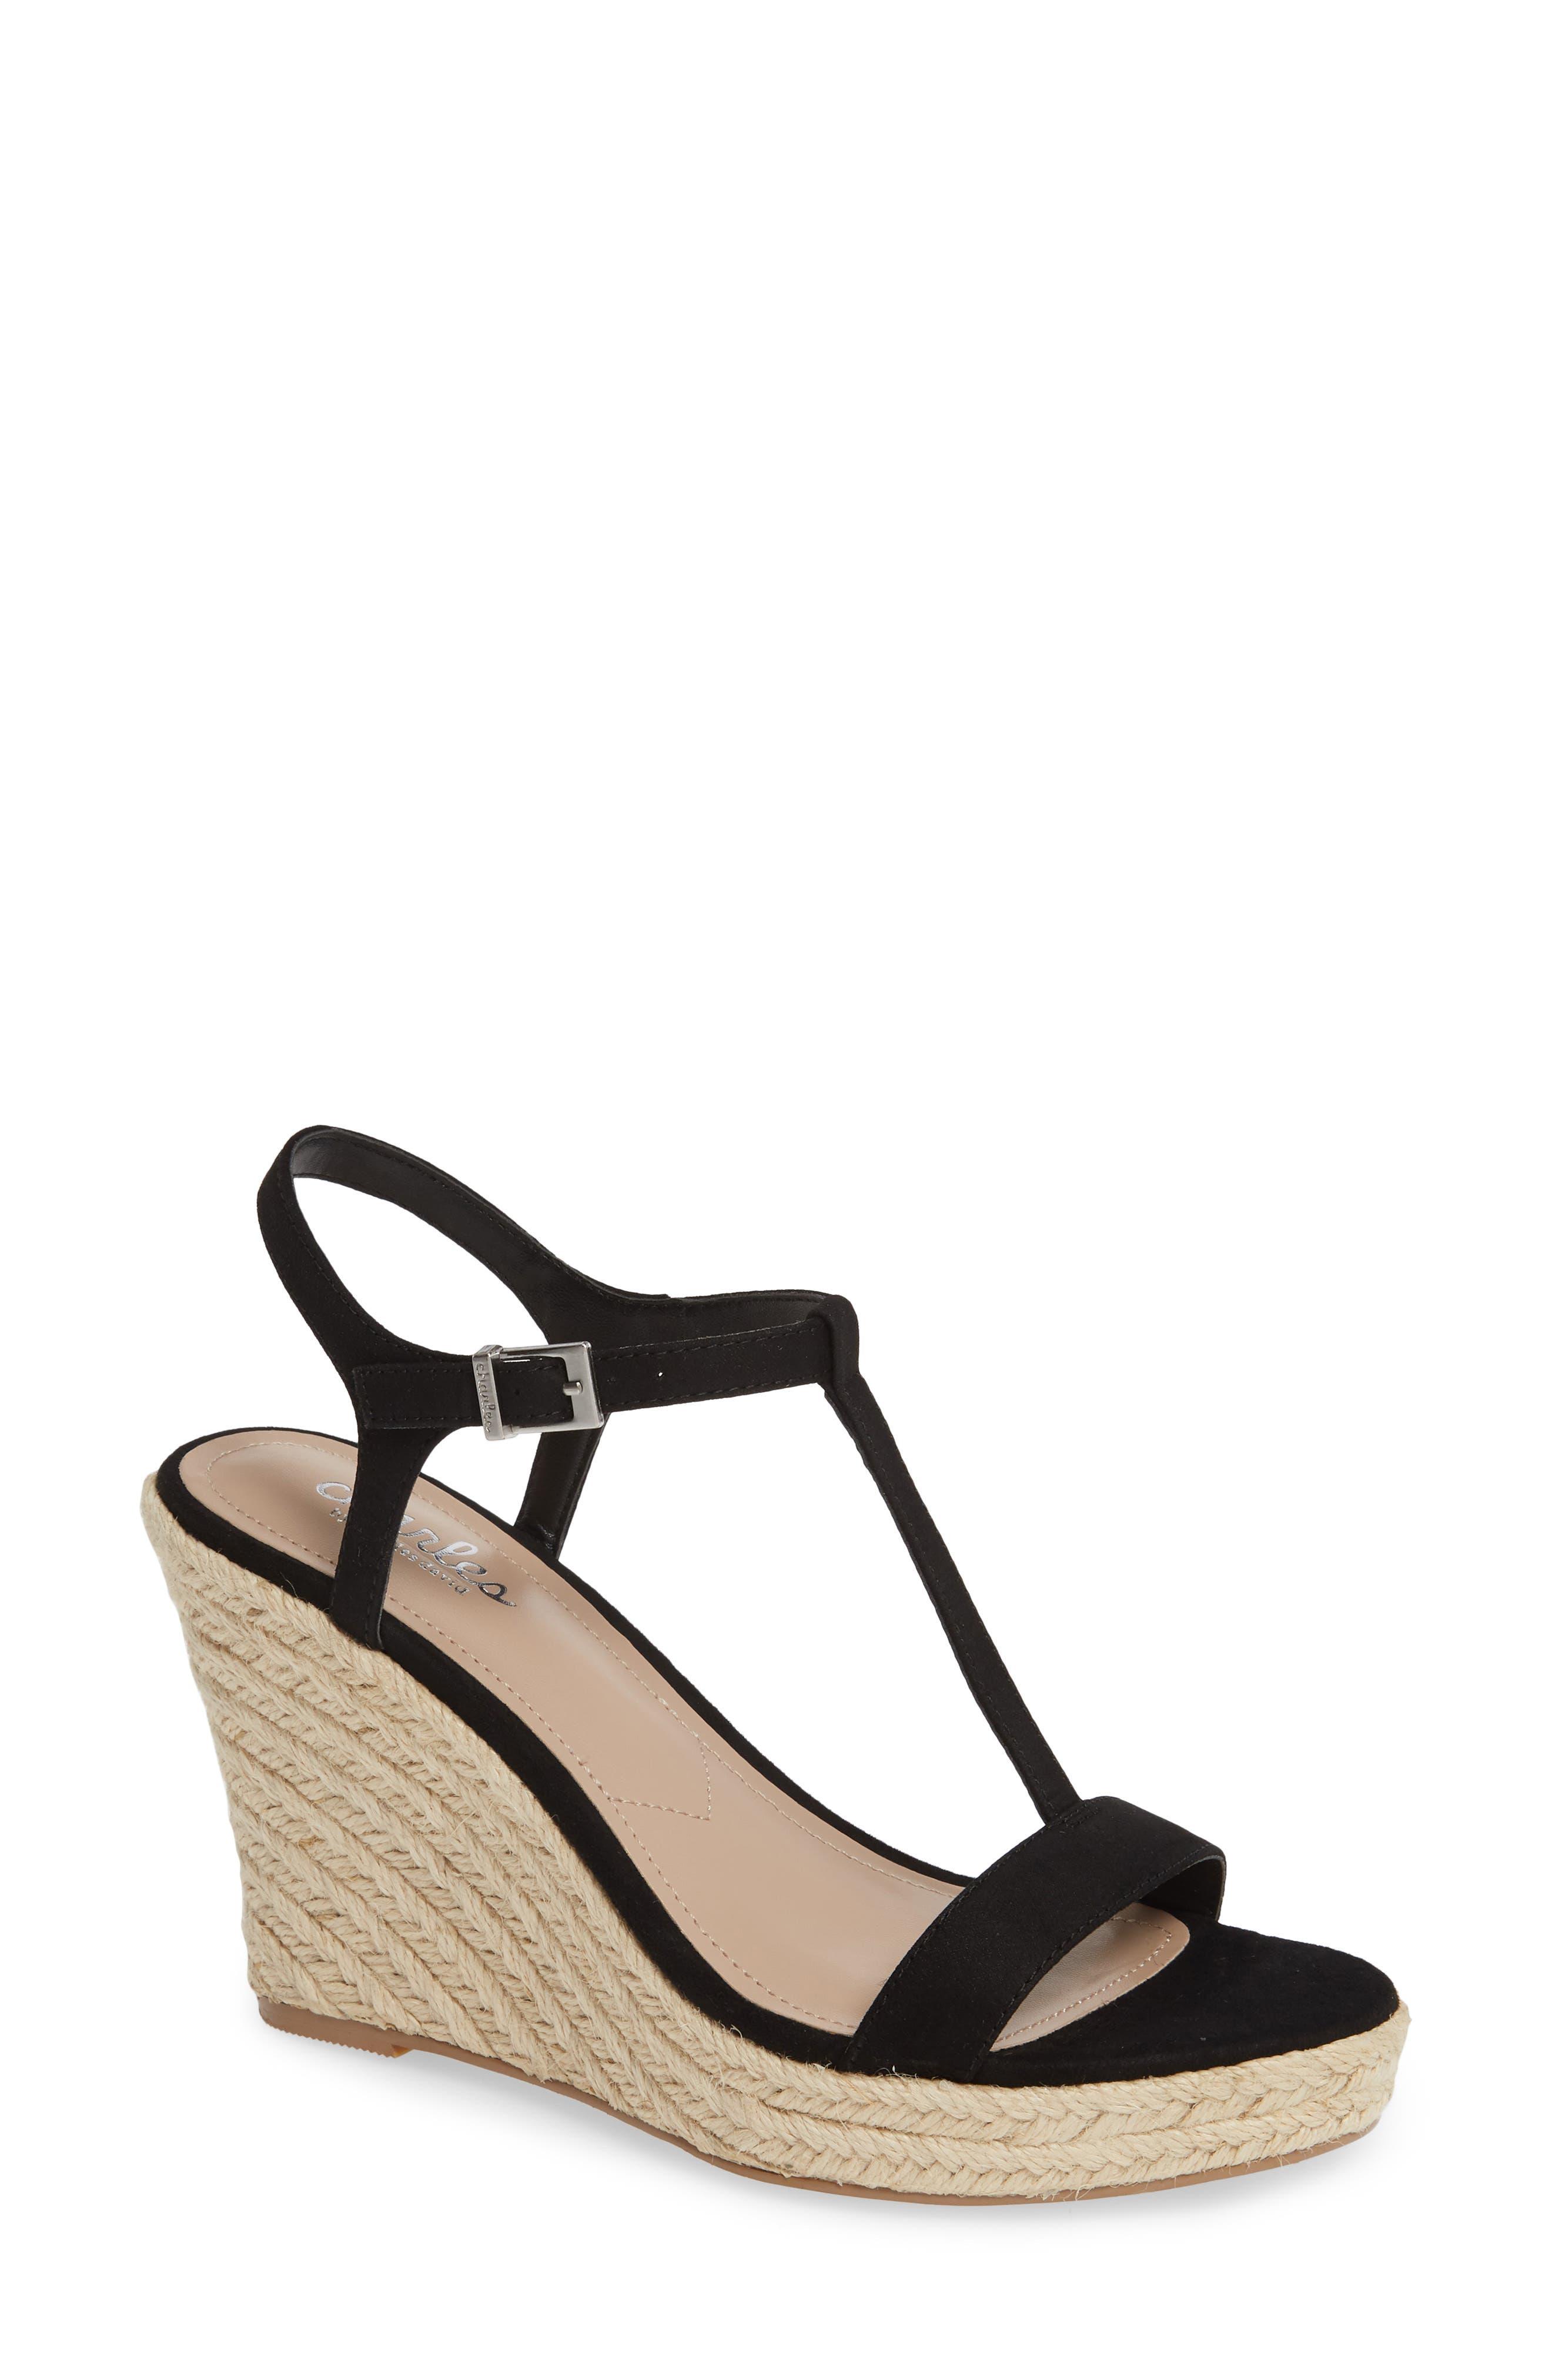 CHARLES BY CHARLES DAVID Lili T-Strap Wedge Sandal, Main, color, BLACK FABRIC